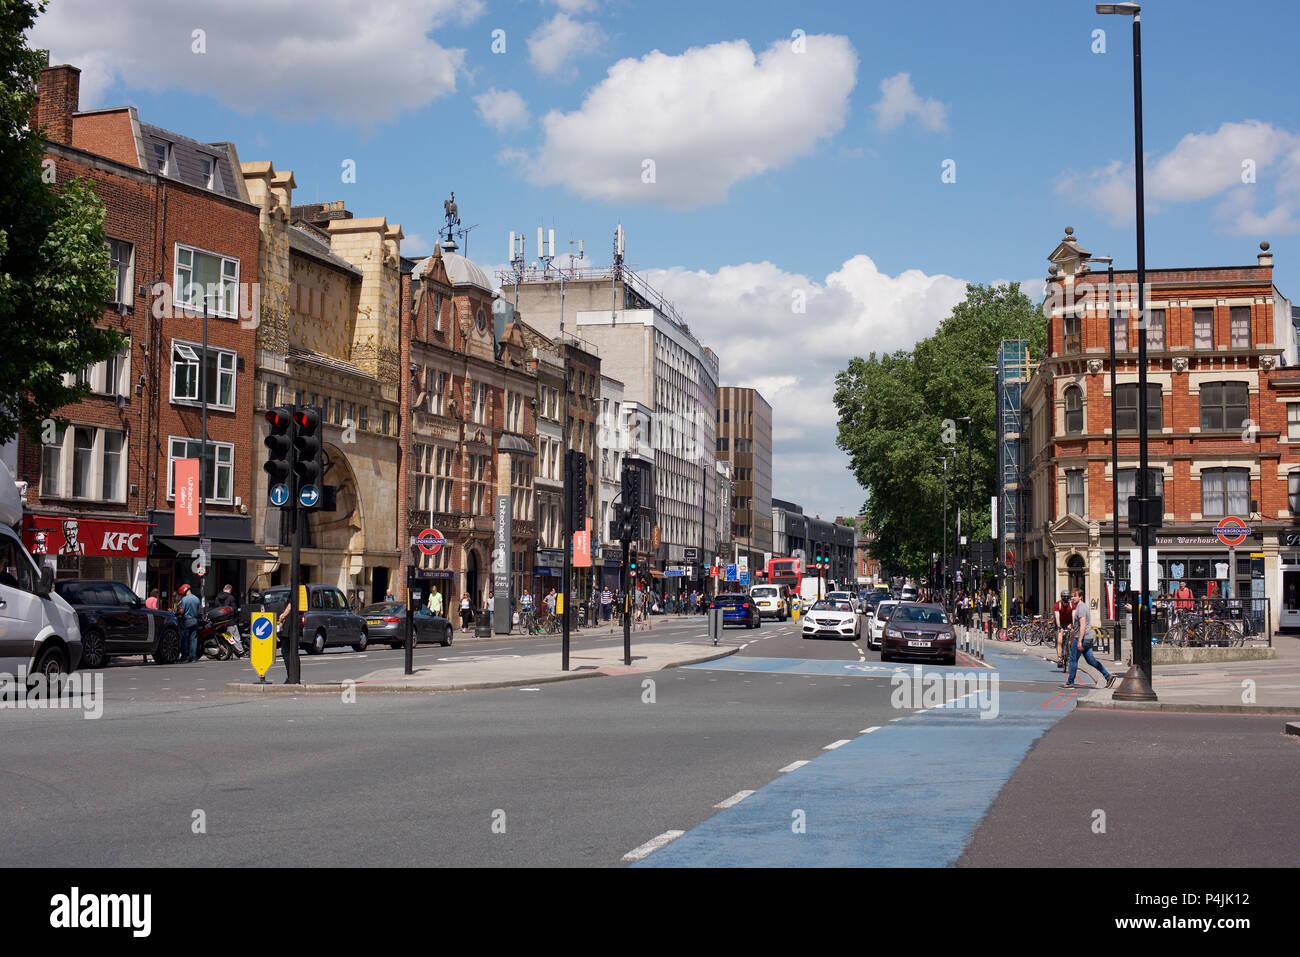 Whitechapel High Street in London E1 Stock Photo